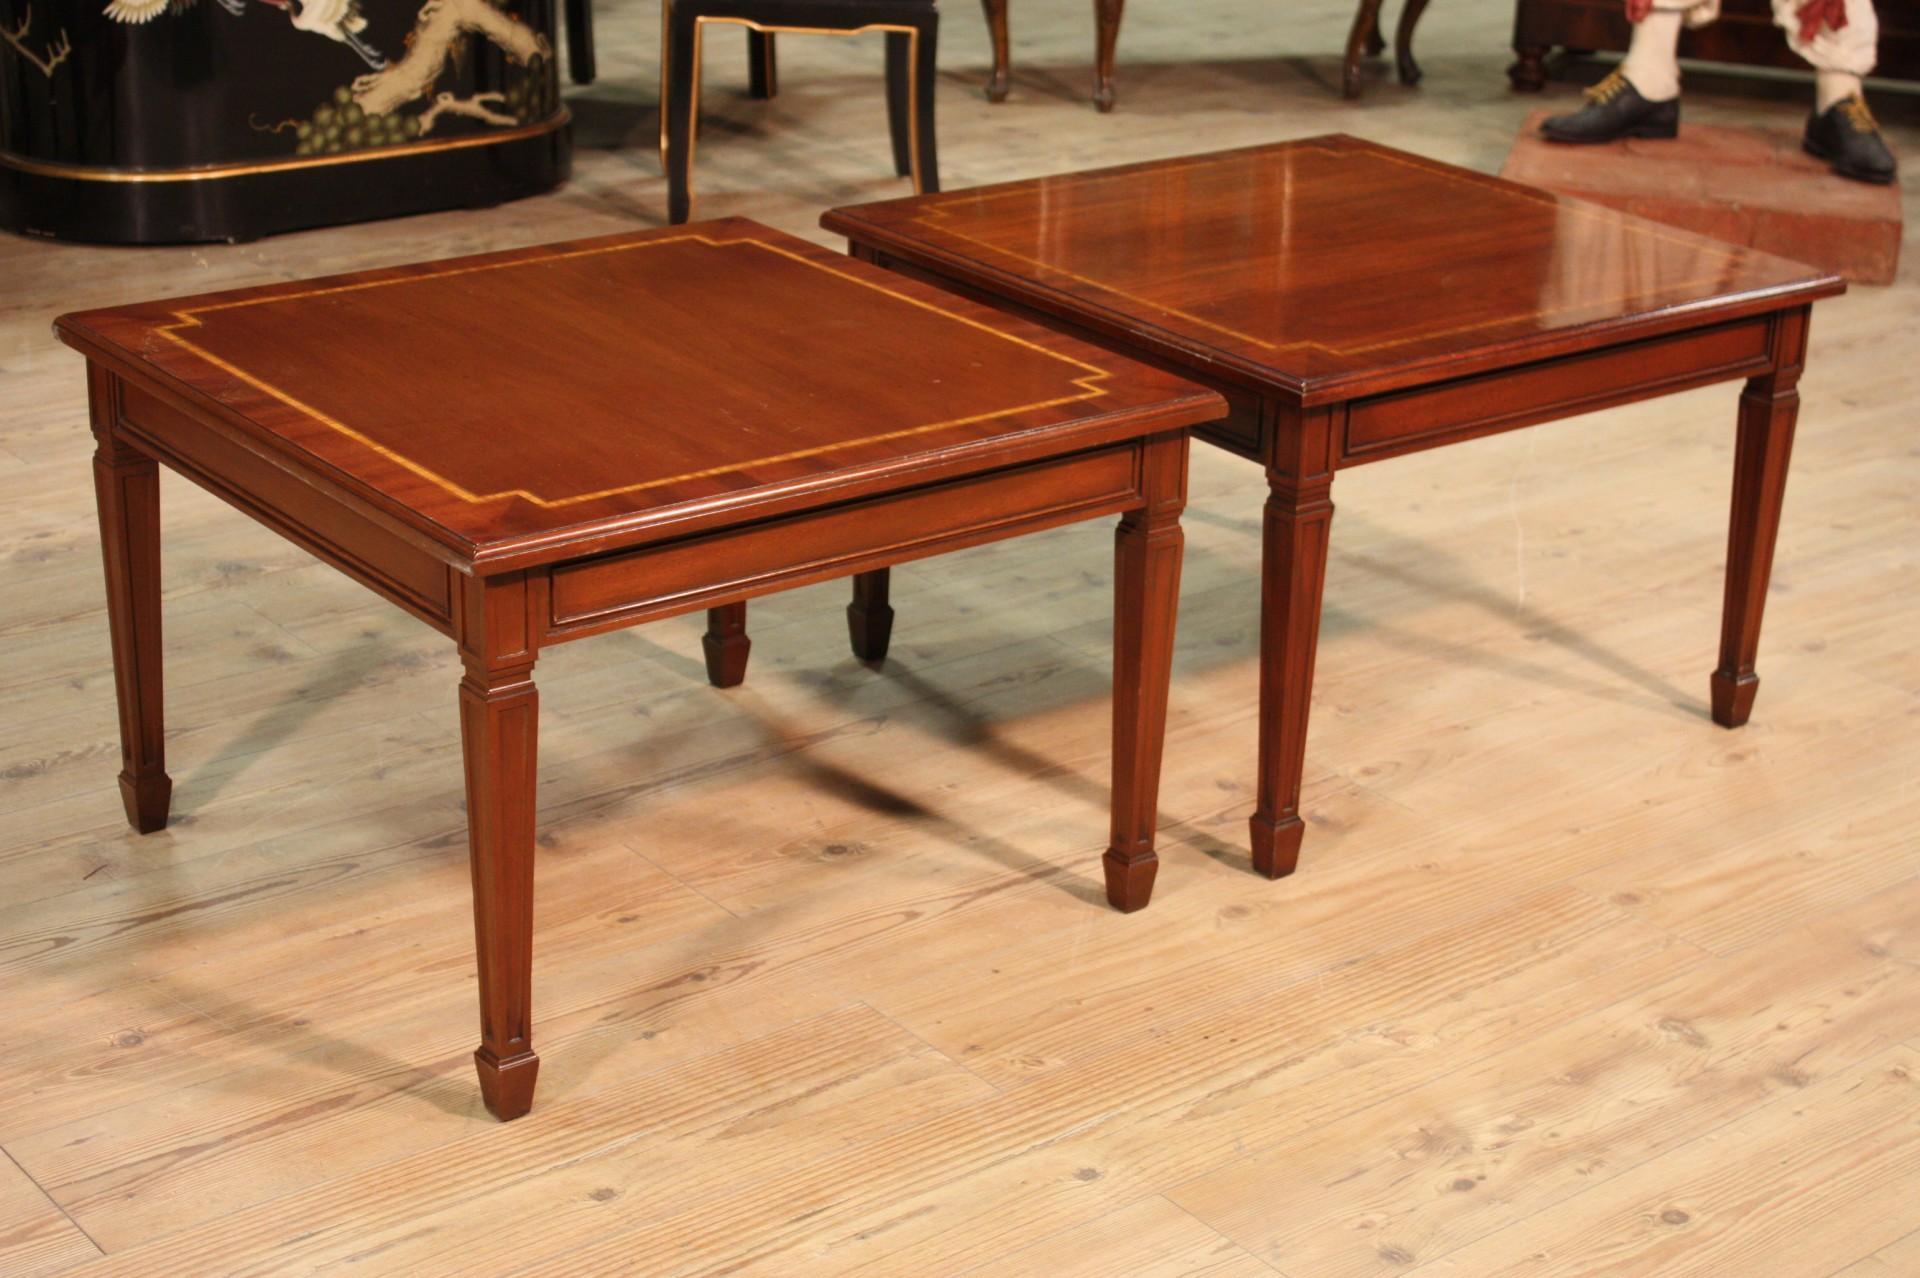 Annuncio: Coppia di tavolini in mogano stile Luigi XVI • NowArc